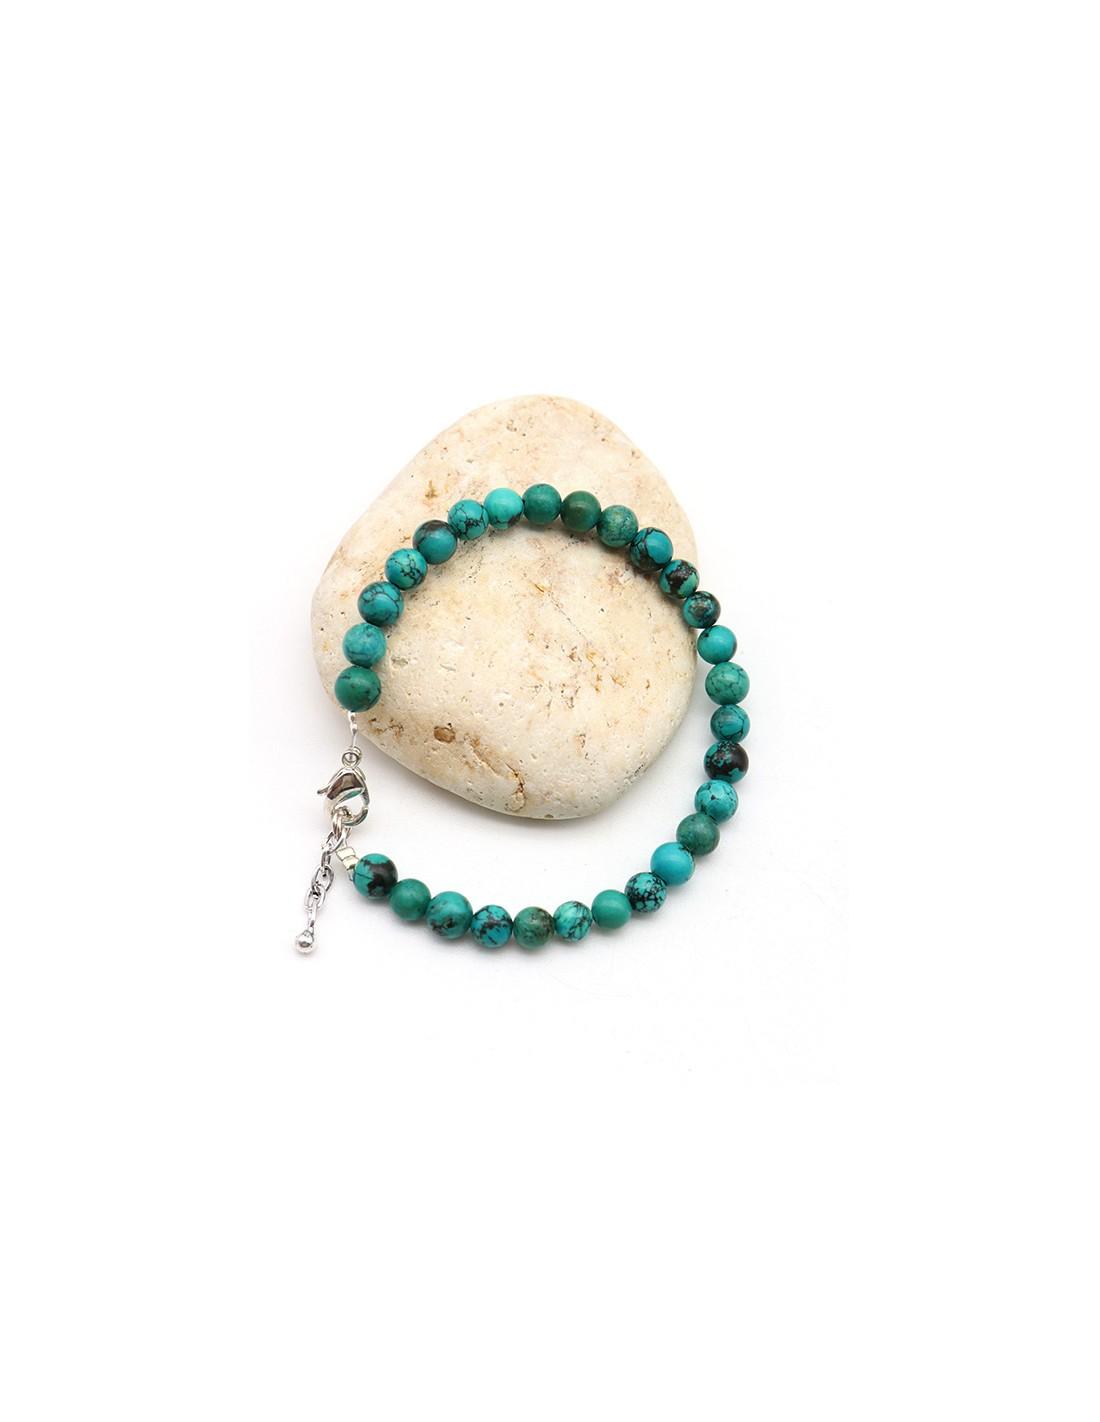 collier 20 perle 6mm Naturel Pierre Turquoise creation bijoux bracelet